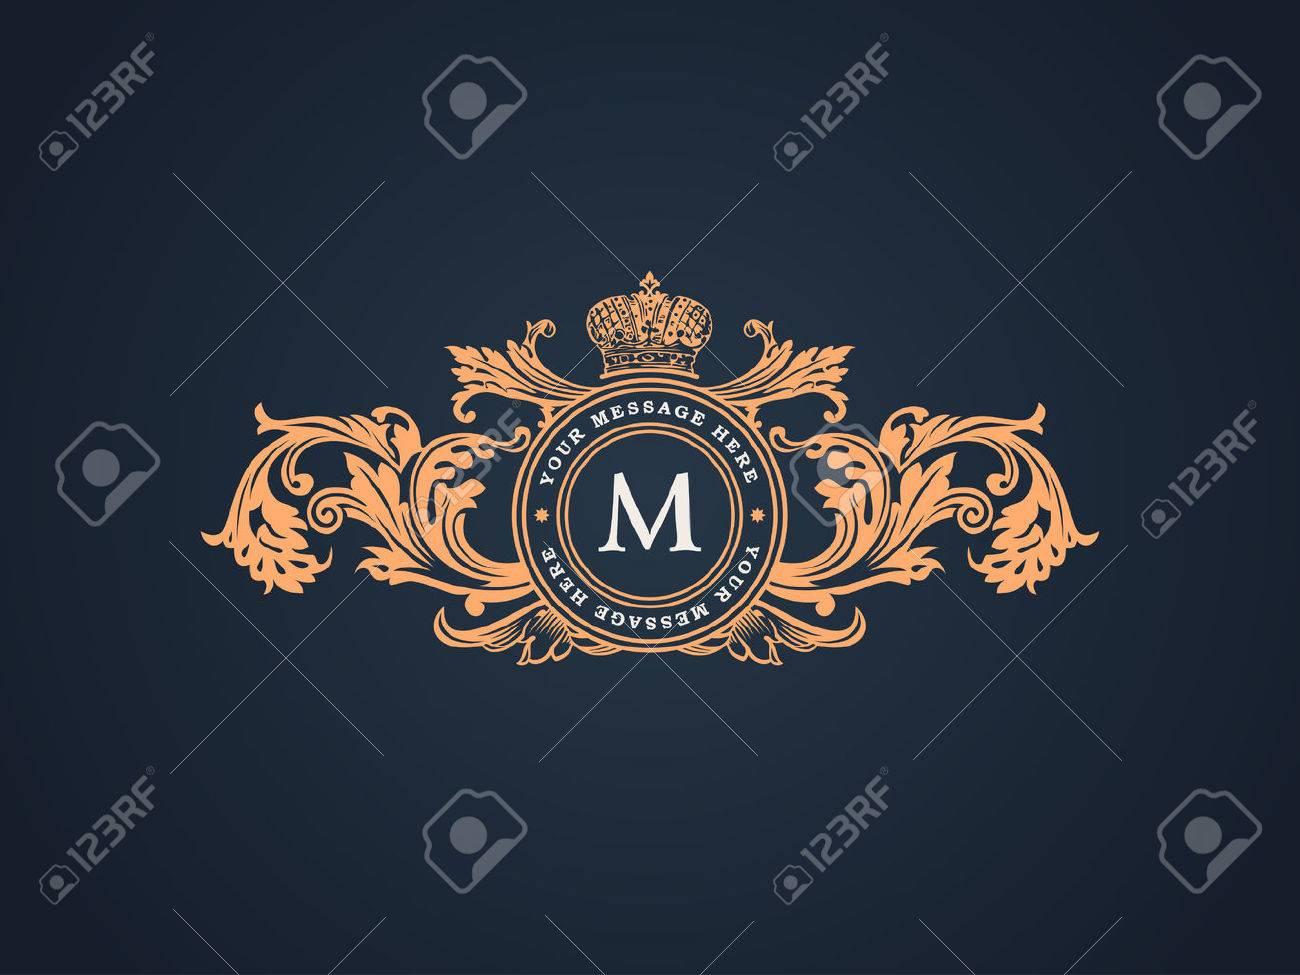 Vintage Decorative Elements Flourishes Calligraphic Ornament. Elegant emblem template monogram luxury frame. Floral royal line logo design. Vector illustration Business sign, identity for restaurant, boutique, heraldic, jewelry, fashion, cafe, hotel - 51828709